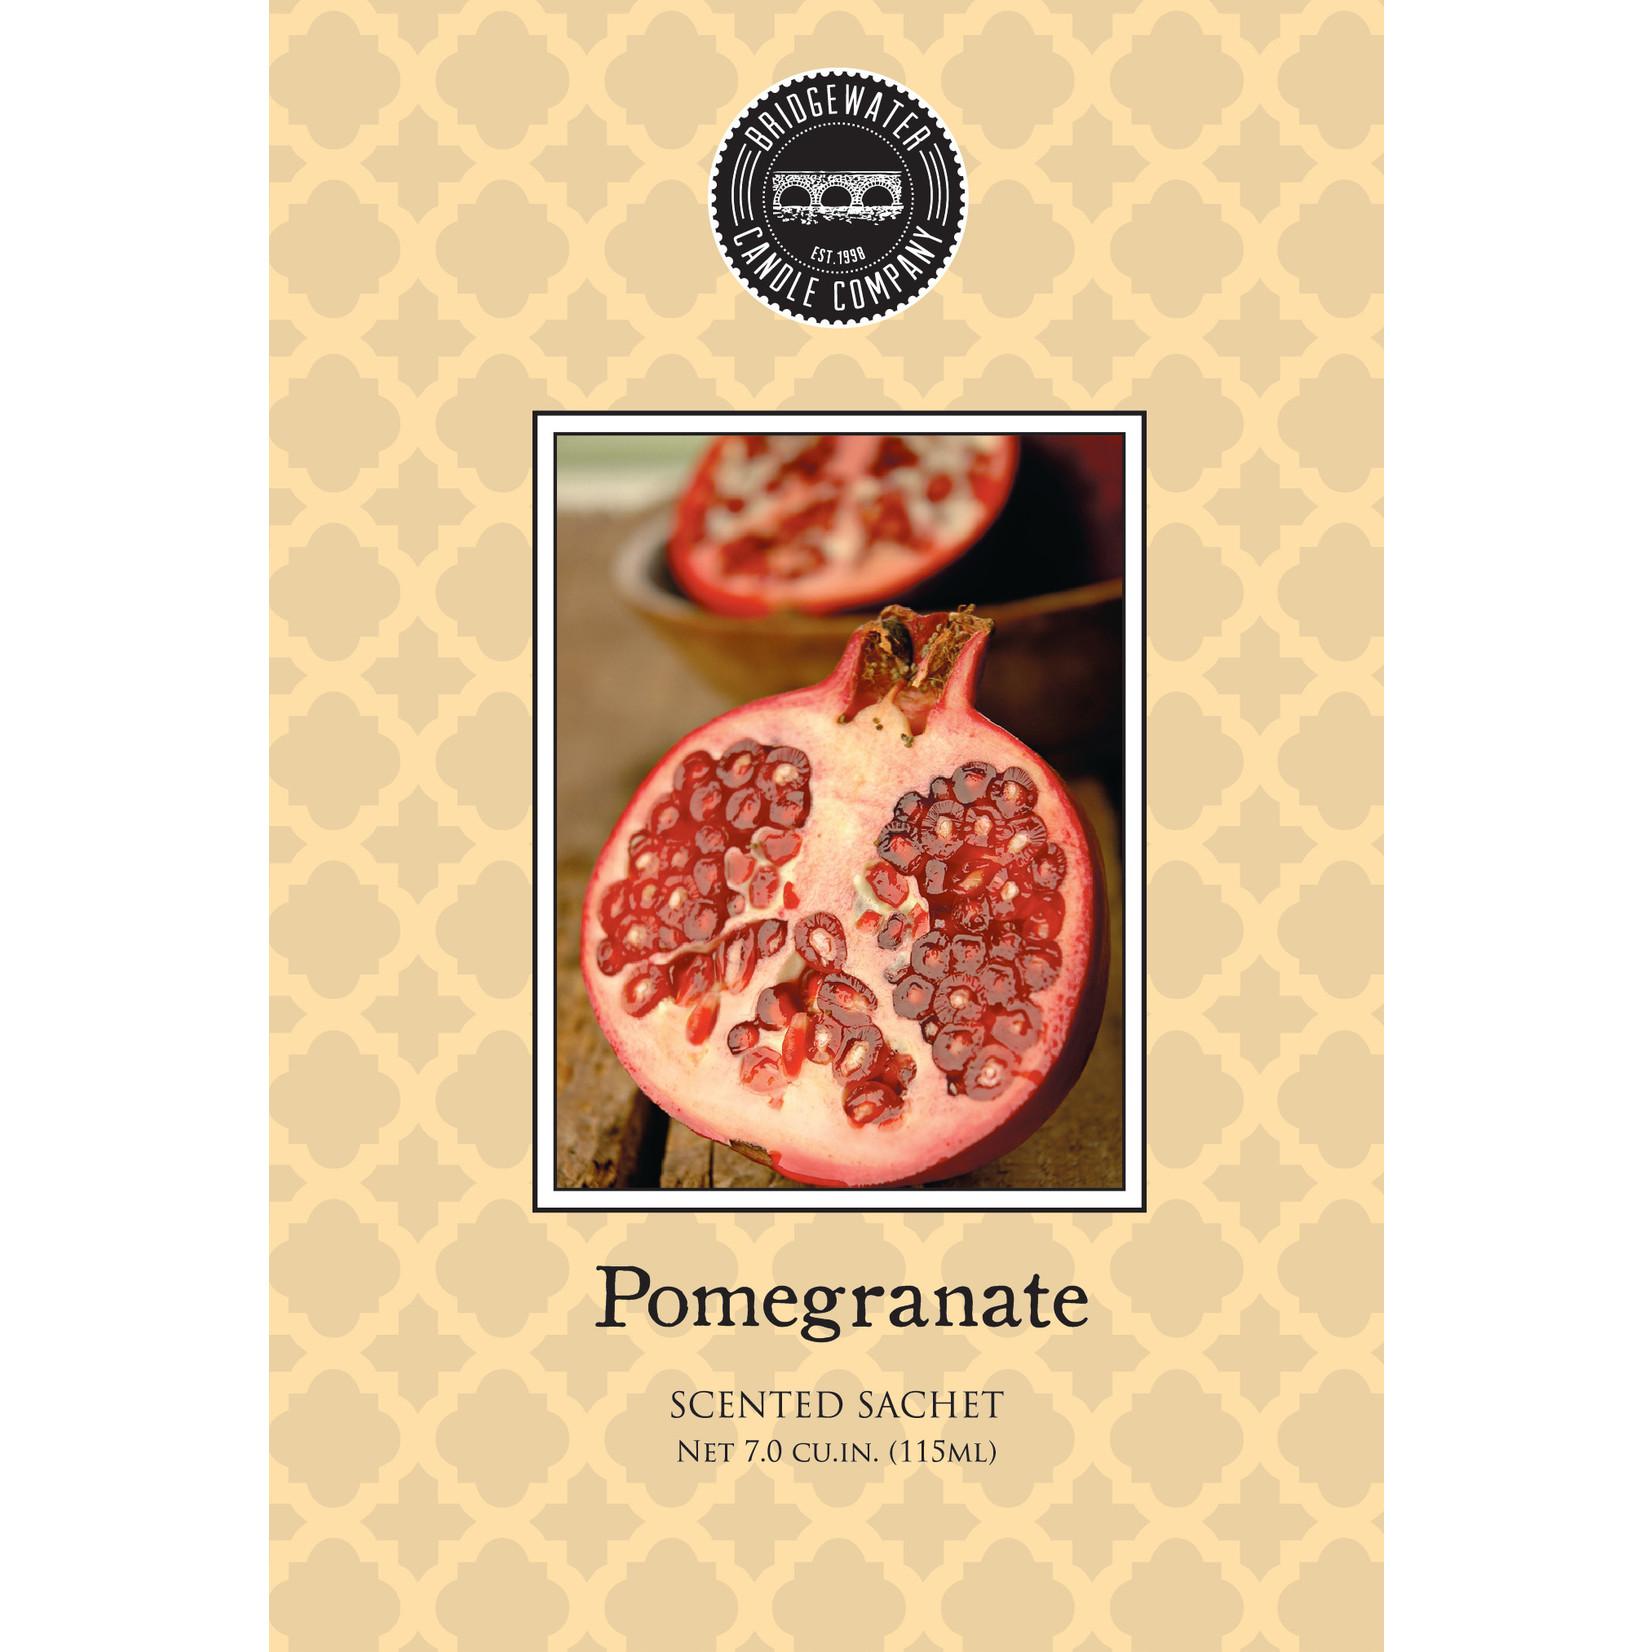 Bridgewater Scented Sachet / Geurzakje Pomegranate